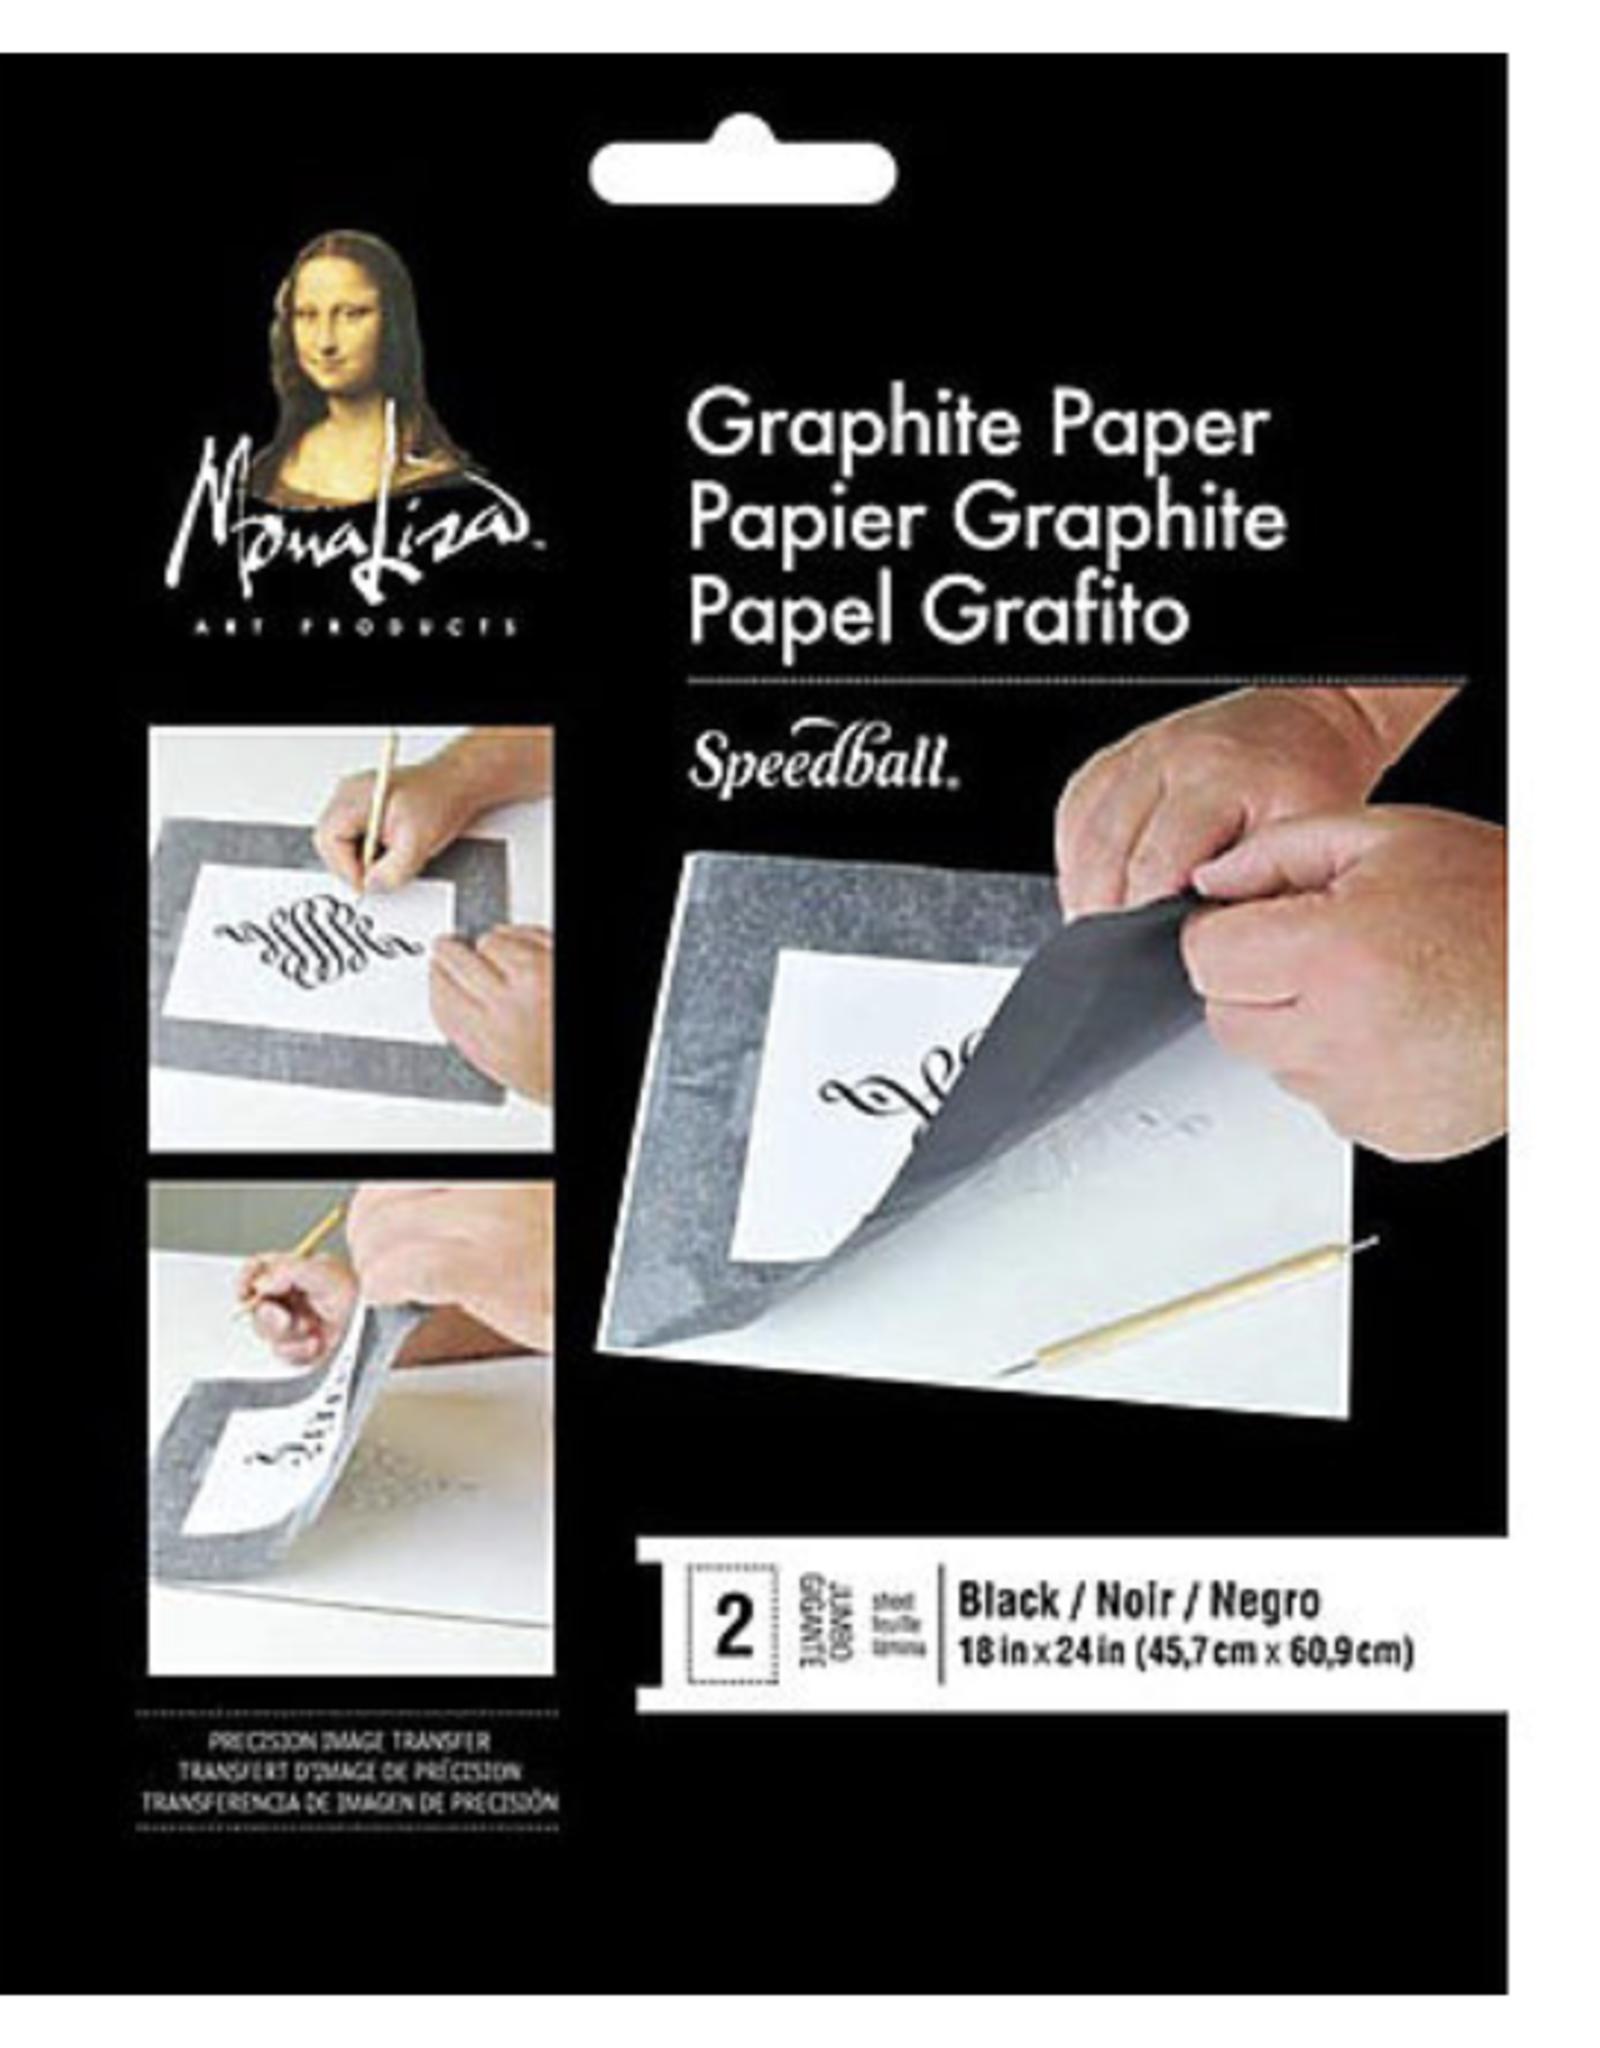 "Mona Lisa Graphite Paper, 18"" x 24"" 2 Sheet Pack"